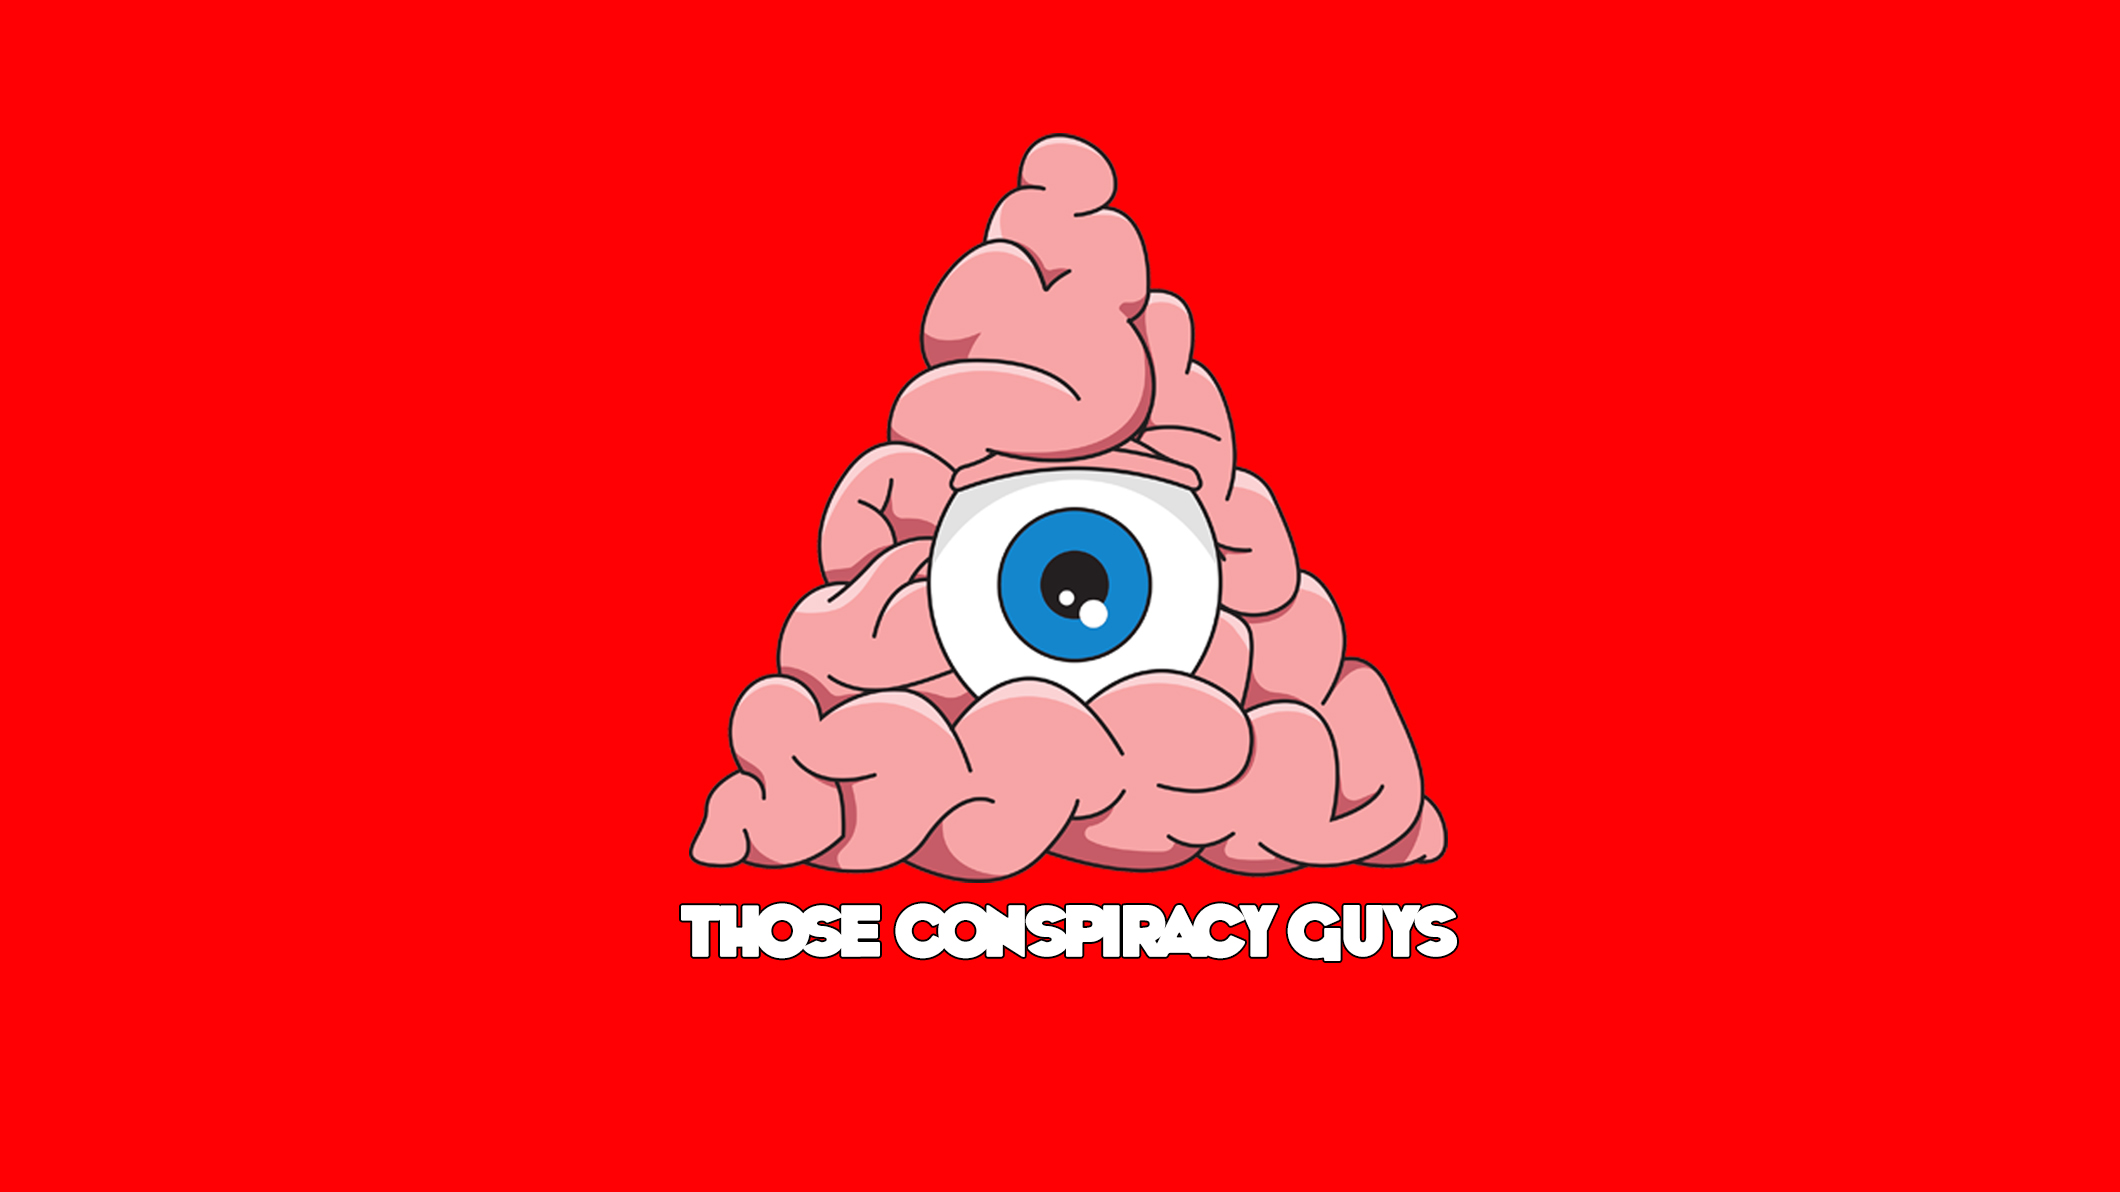 Those Conspiracy Guys Image